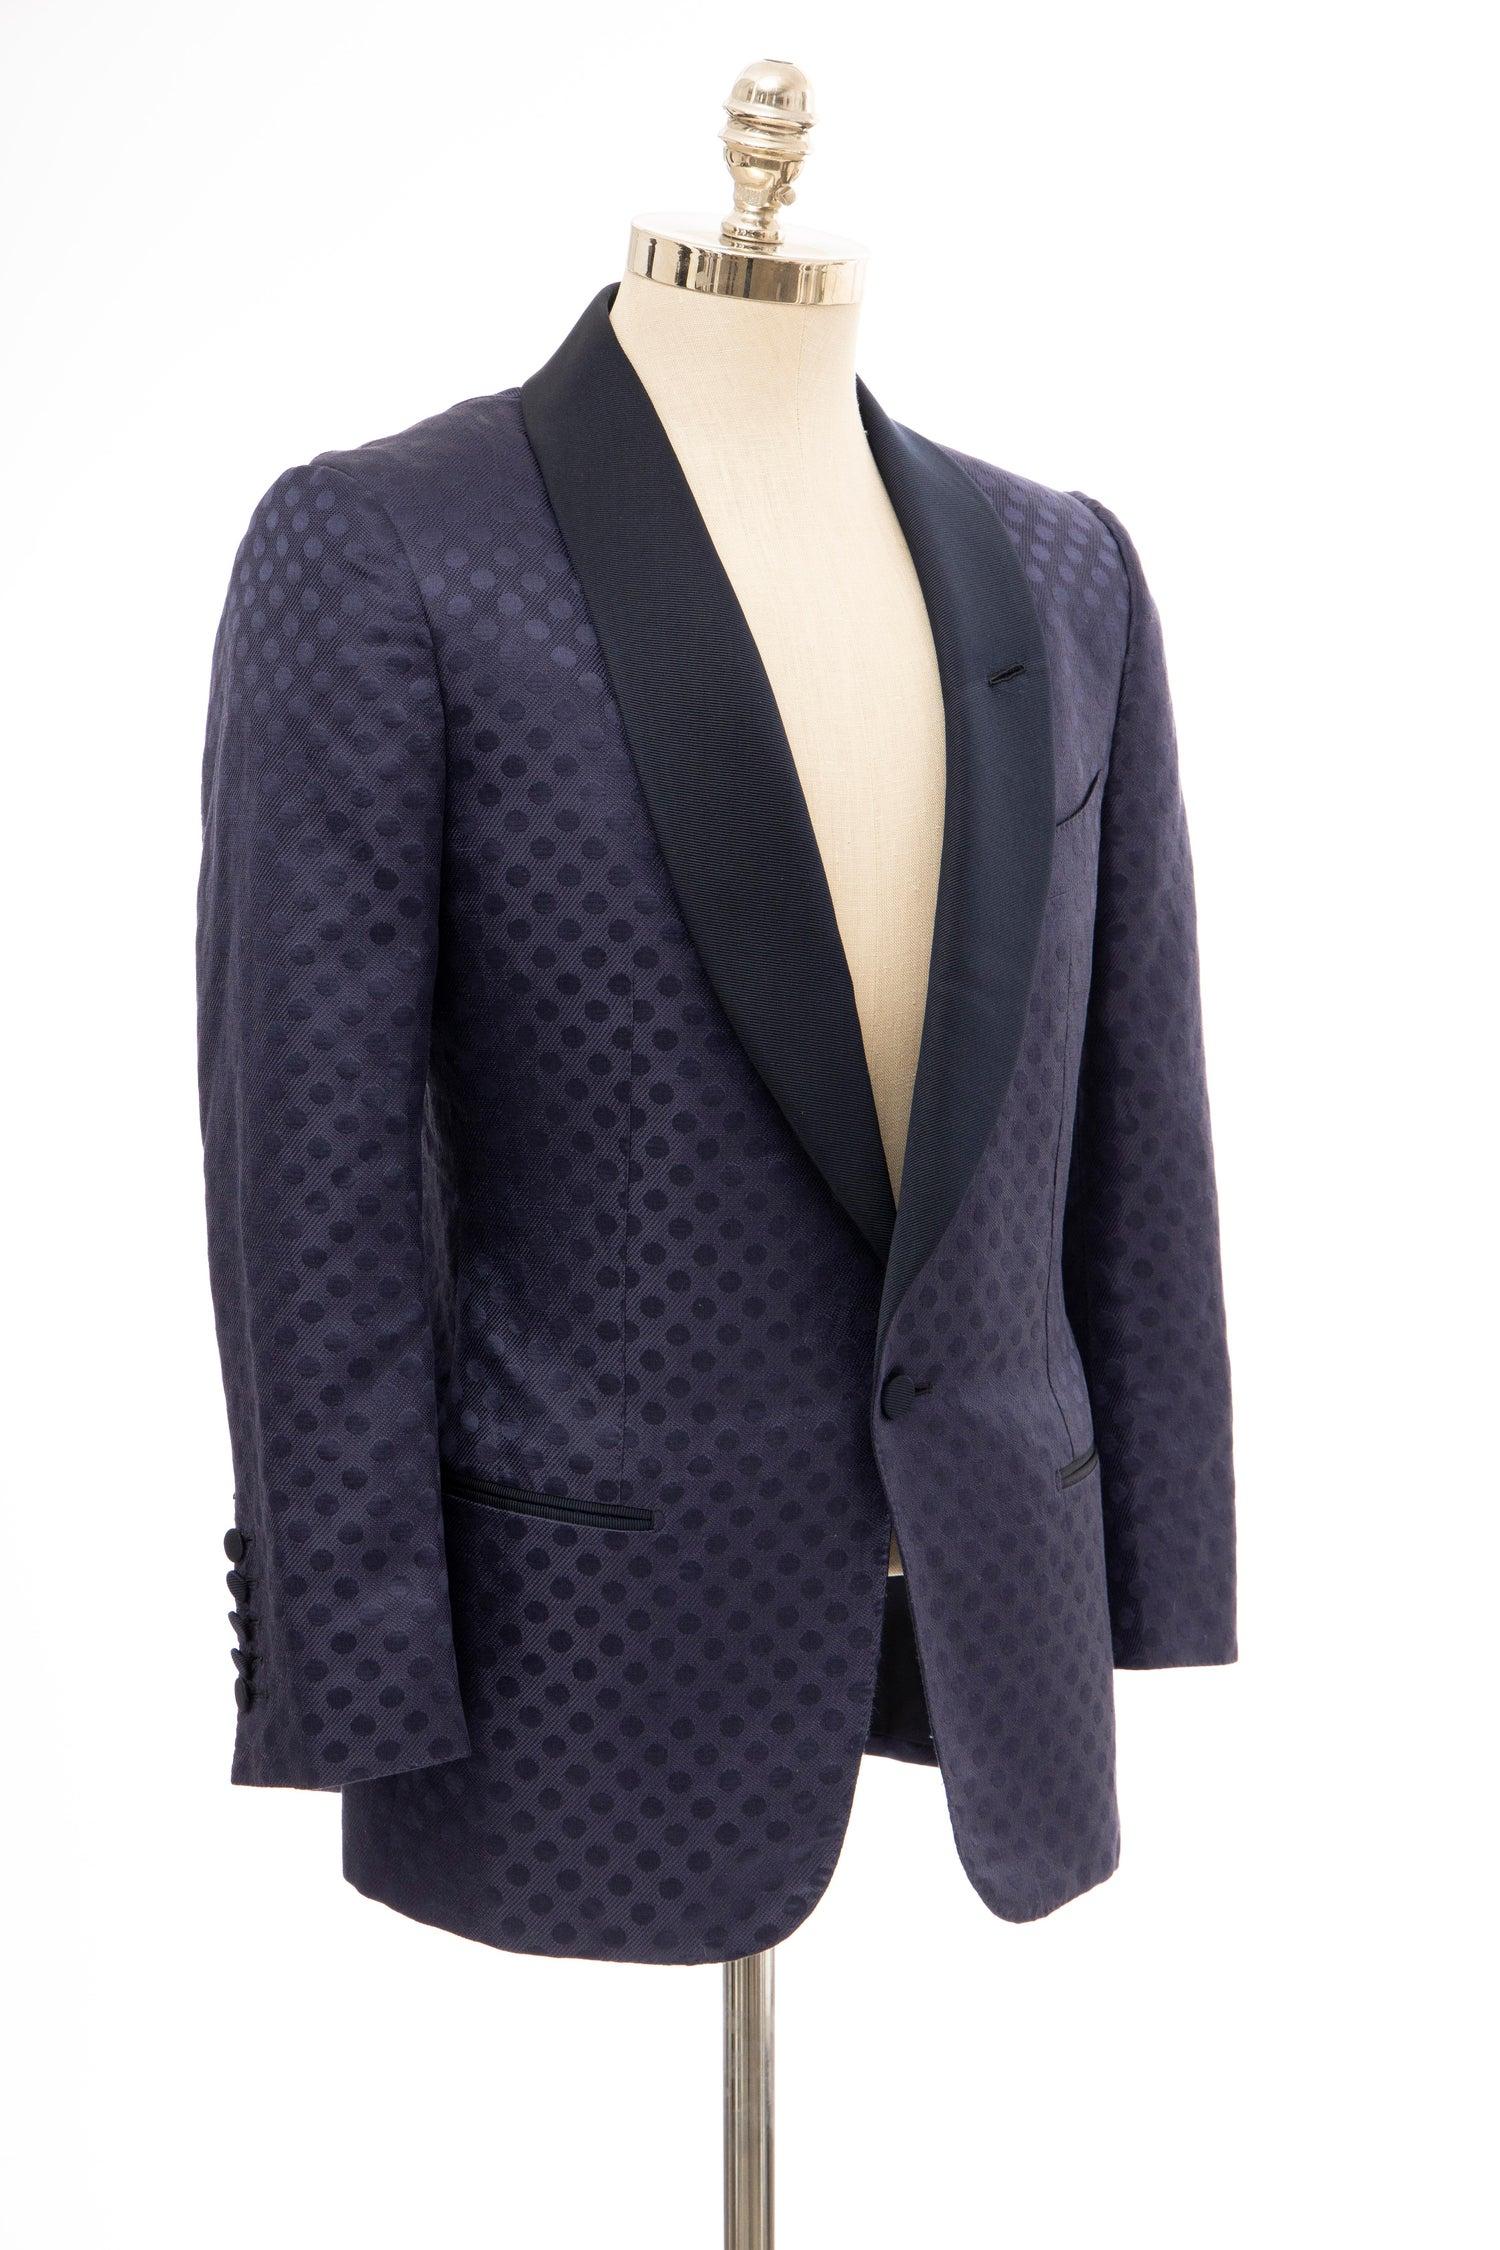 9ec0f73e888 Tom Ford Men's Runway Navy Blue Silk Linen Dinner Jacket, Spring 2012 For  Sale at 1stdibs